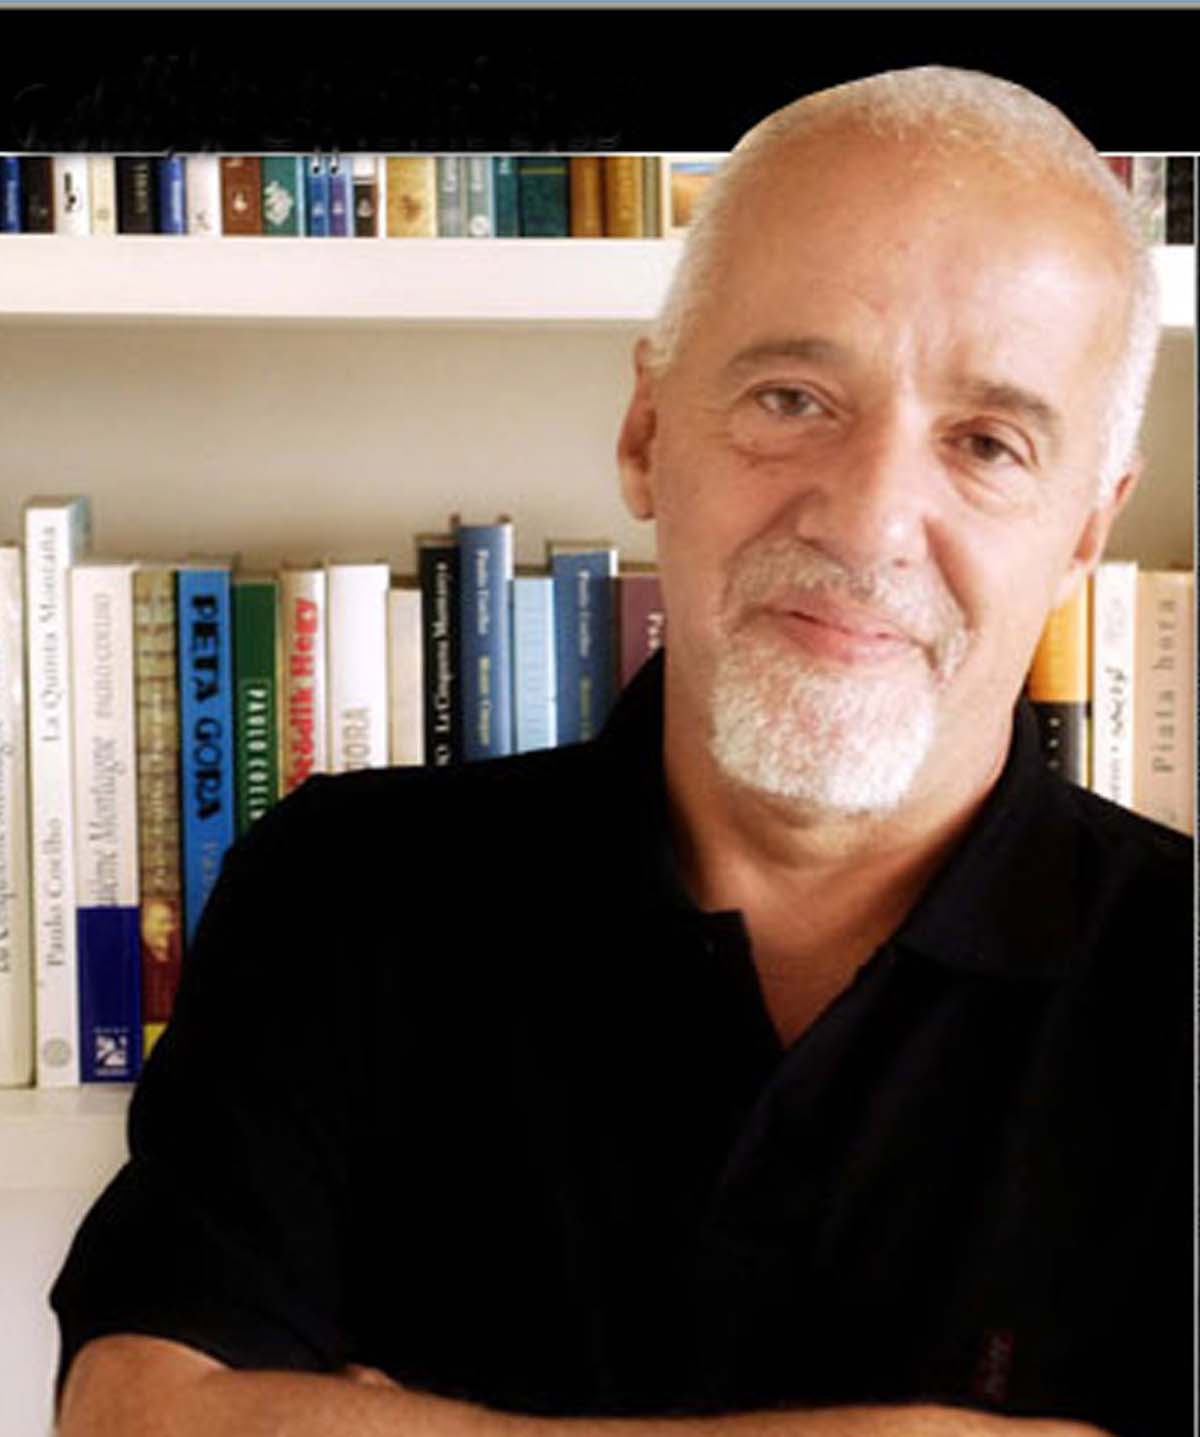 paulo coelho biography Paulo coelho (portuguese: [ˈpawlu kuˈeʎu] born august 24, 1947), is a brazilian lyricist and novelist coelho was born in brazil  [1] he went to a jesuit school.